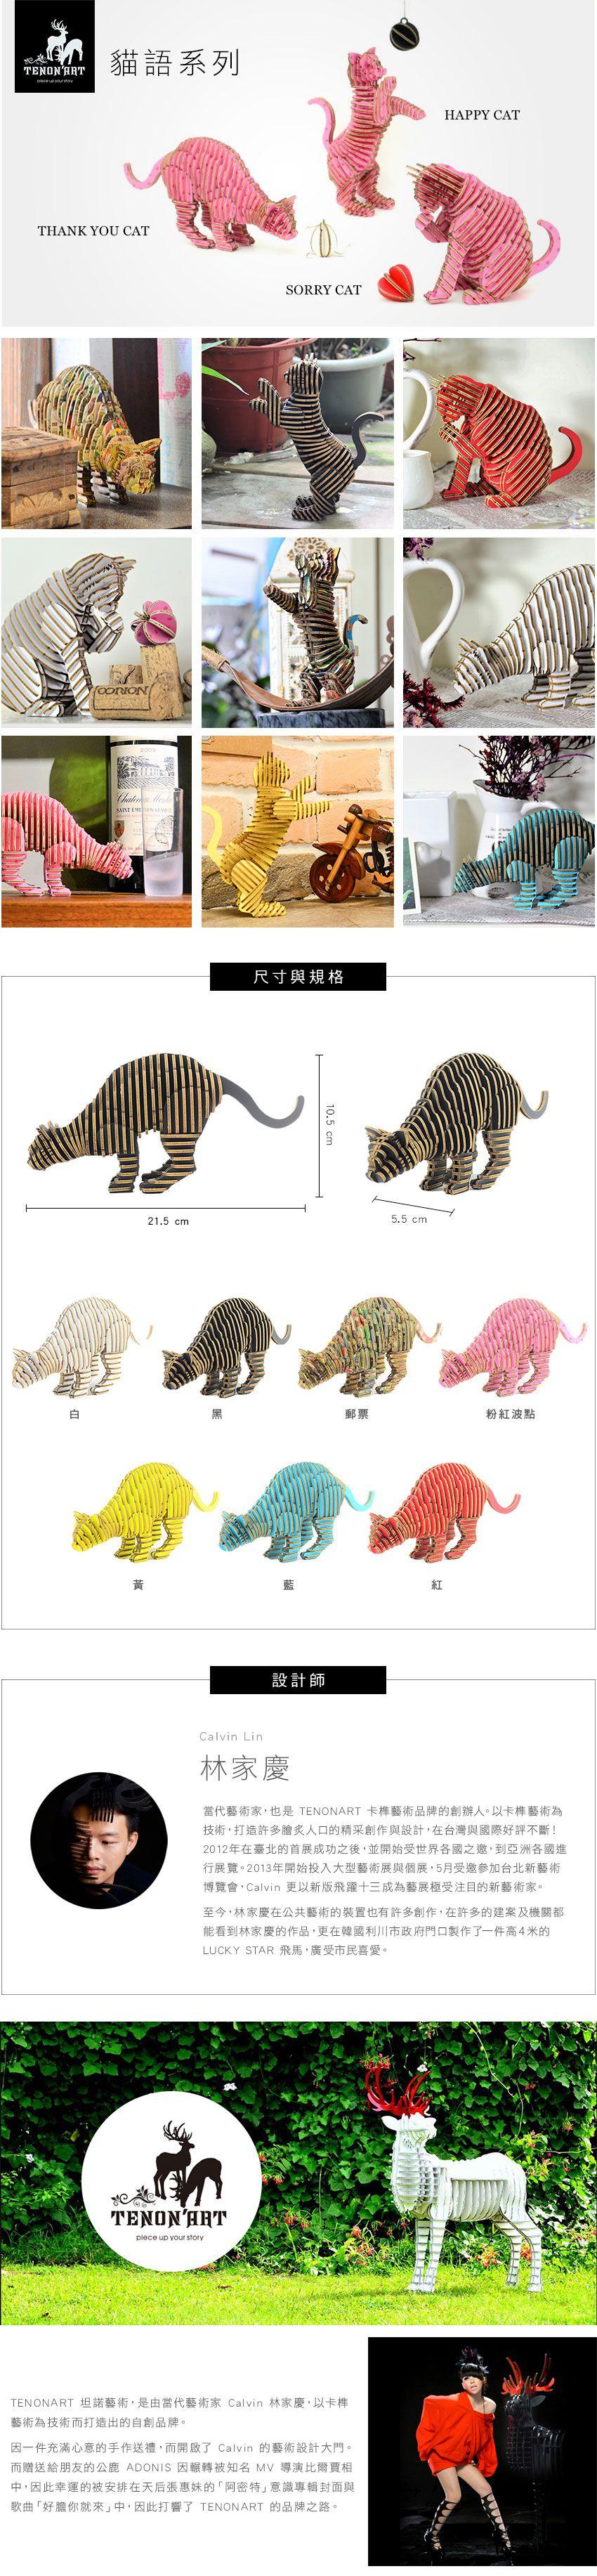 TENONART 貓語系列 THANK YOU CAT (郵票/未組裝)